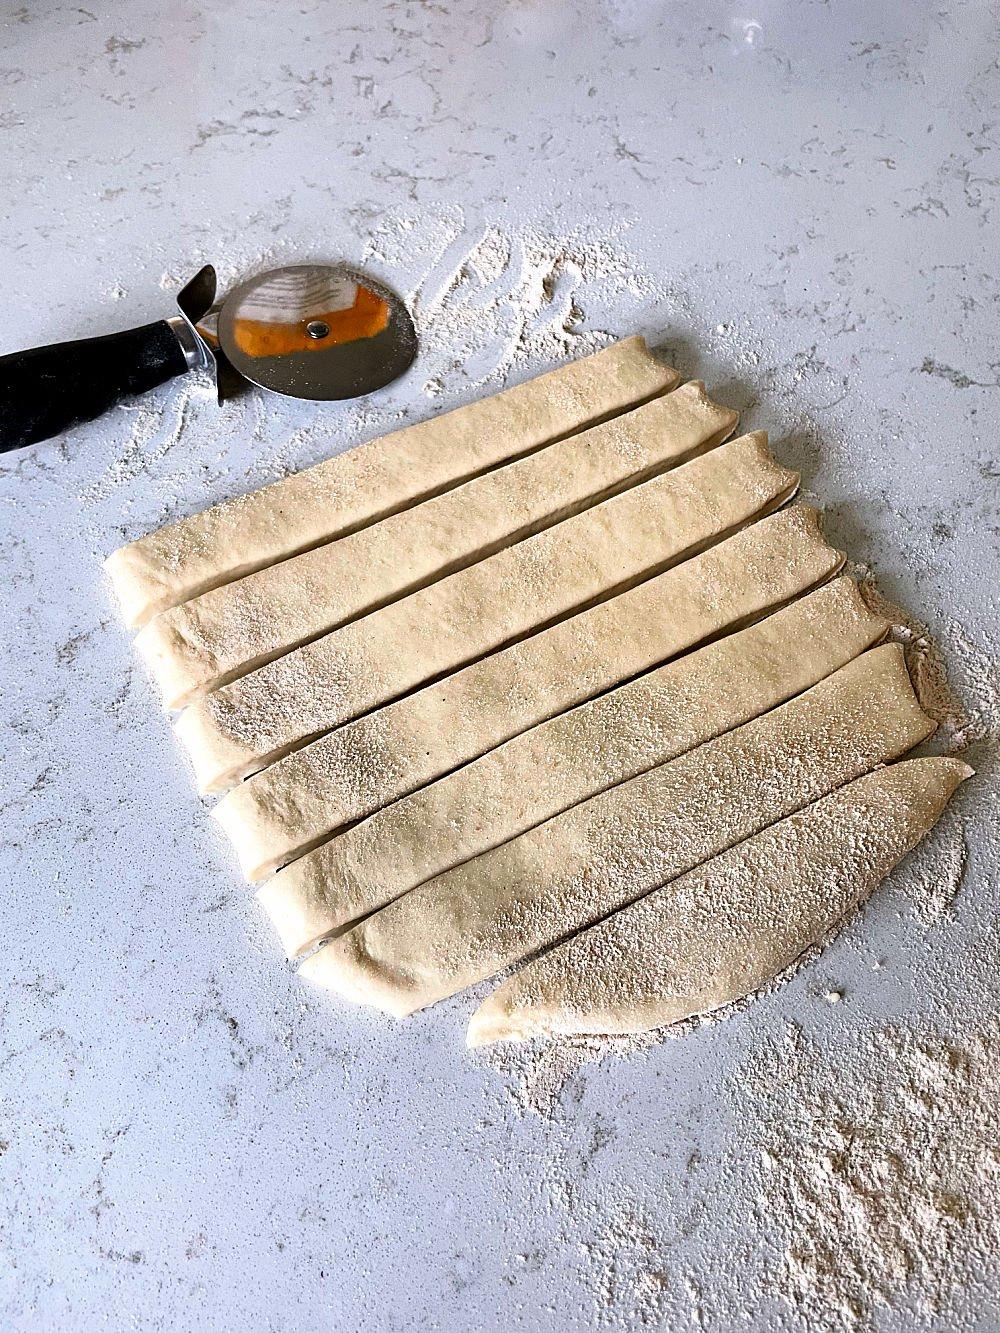 bread dough cut into strips for breadsticks